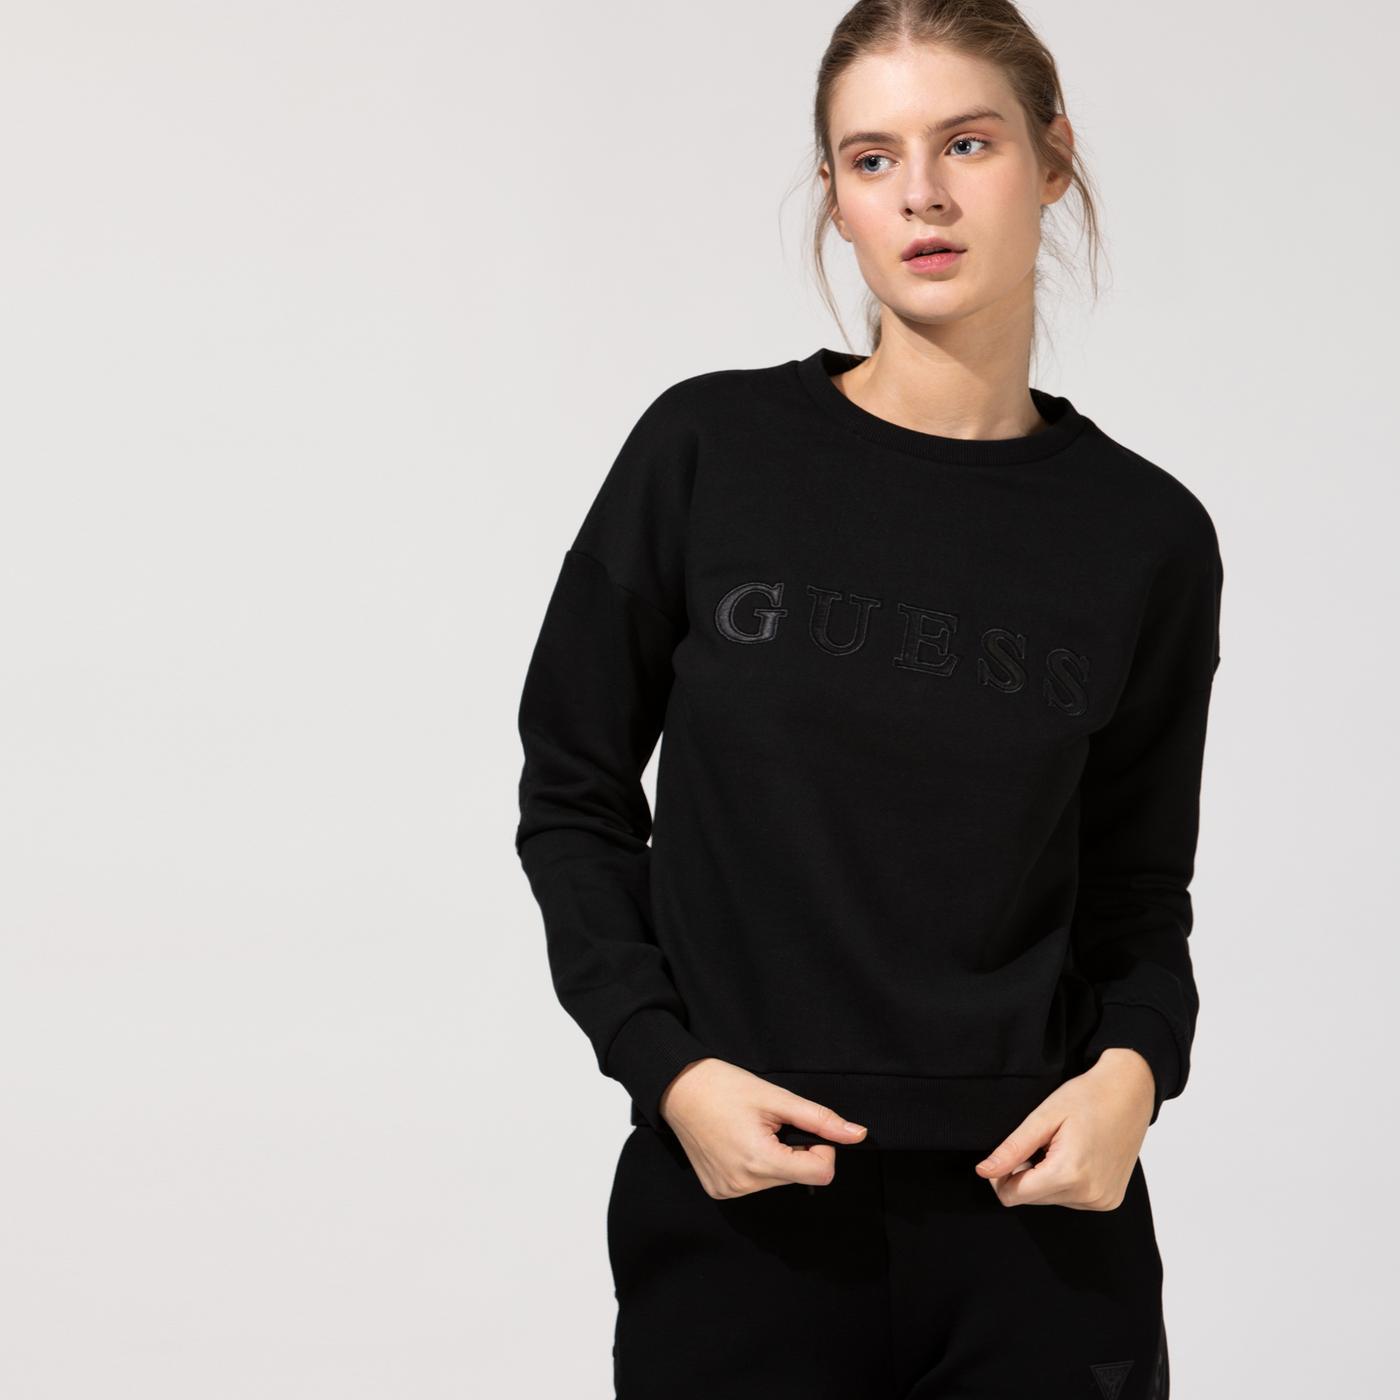 Guess Kadın Siyah Sweatshirt